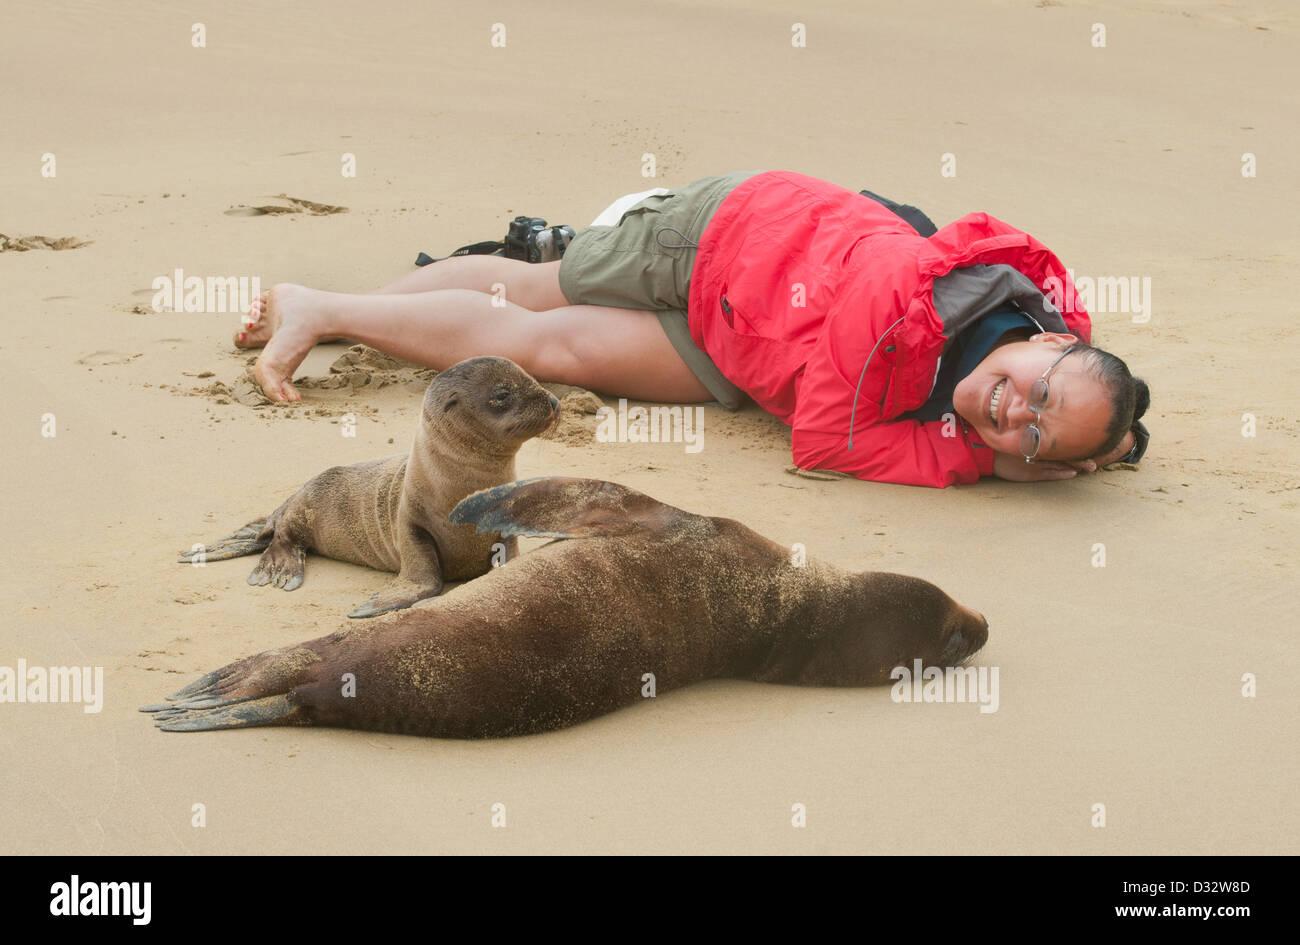 Tracey Lee and Galapagos Sea Lions, Isabela island, Galapagos - Stock Image